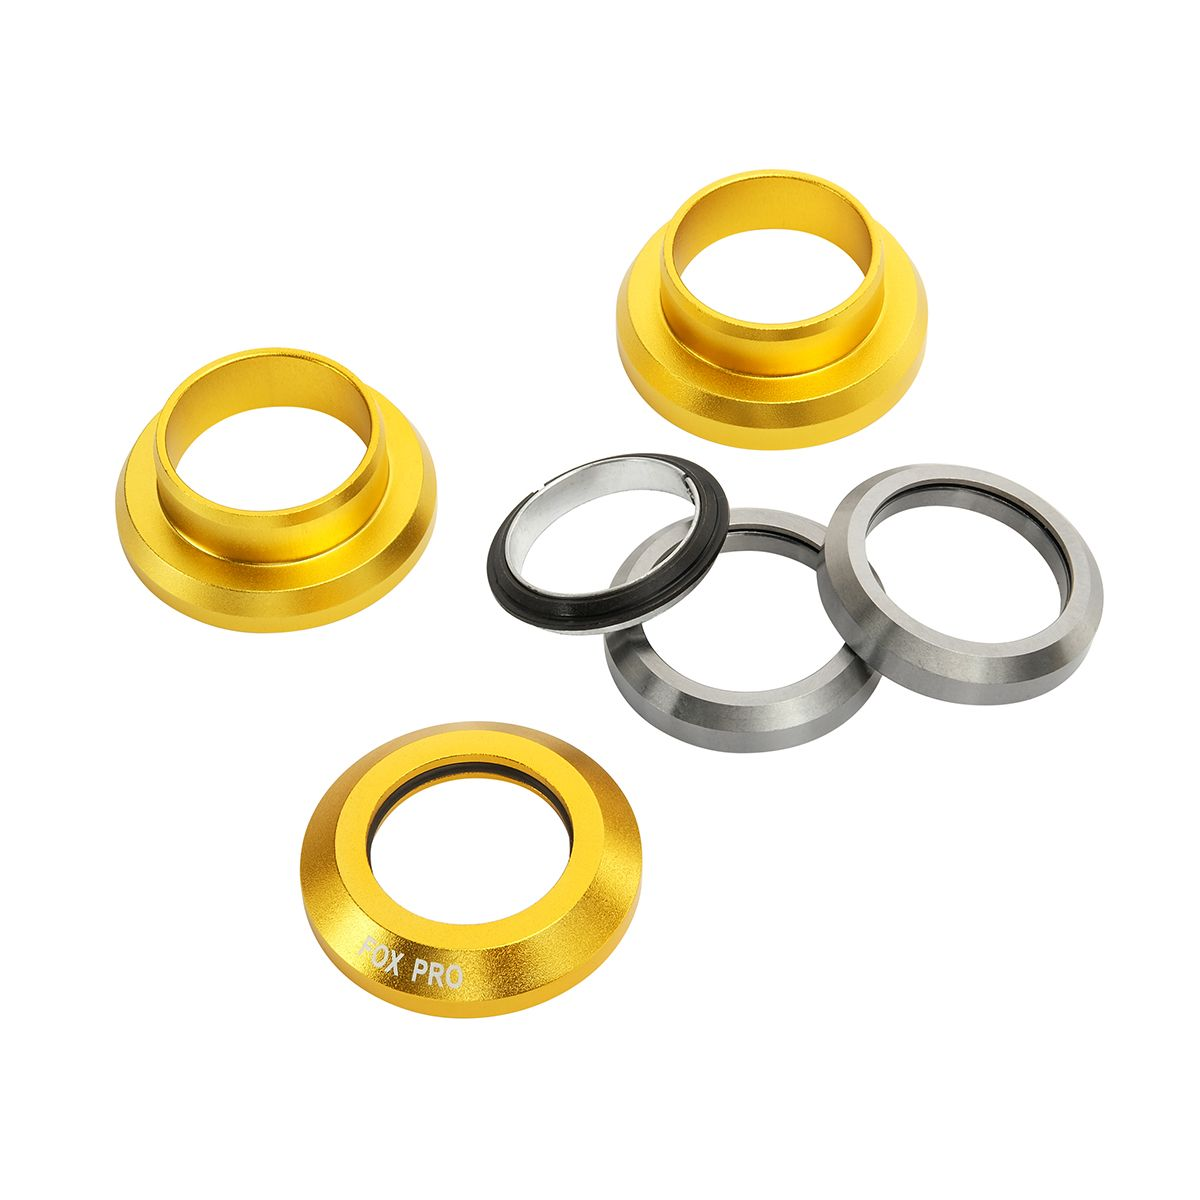 Рулевая колонка Fox стандарт 1 1/8 silver/gold